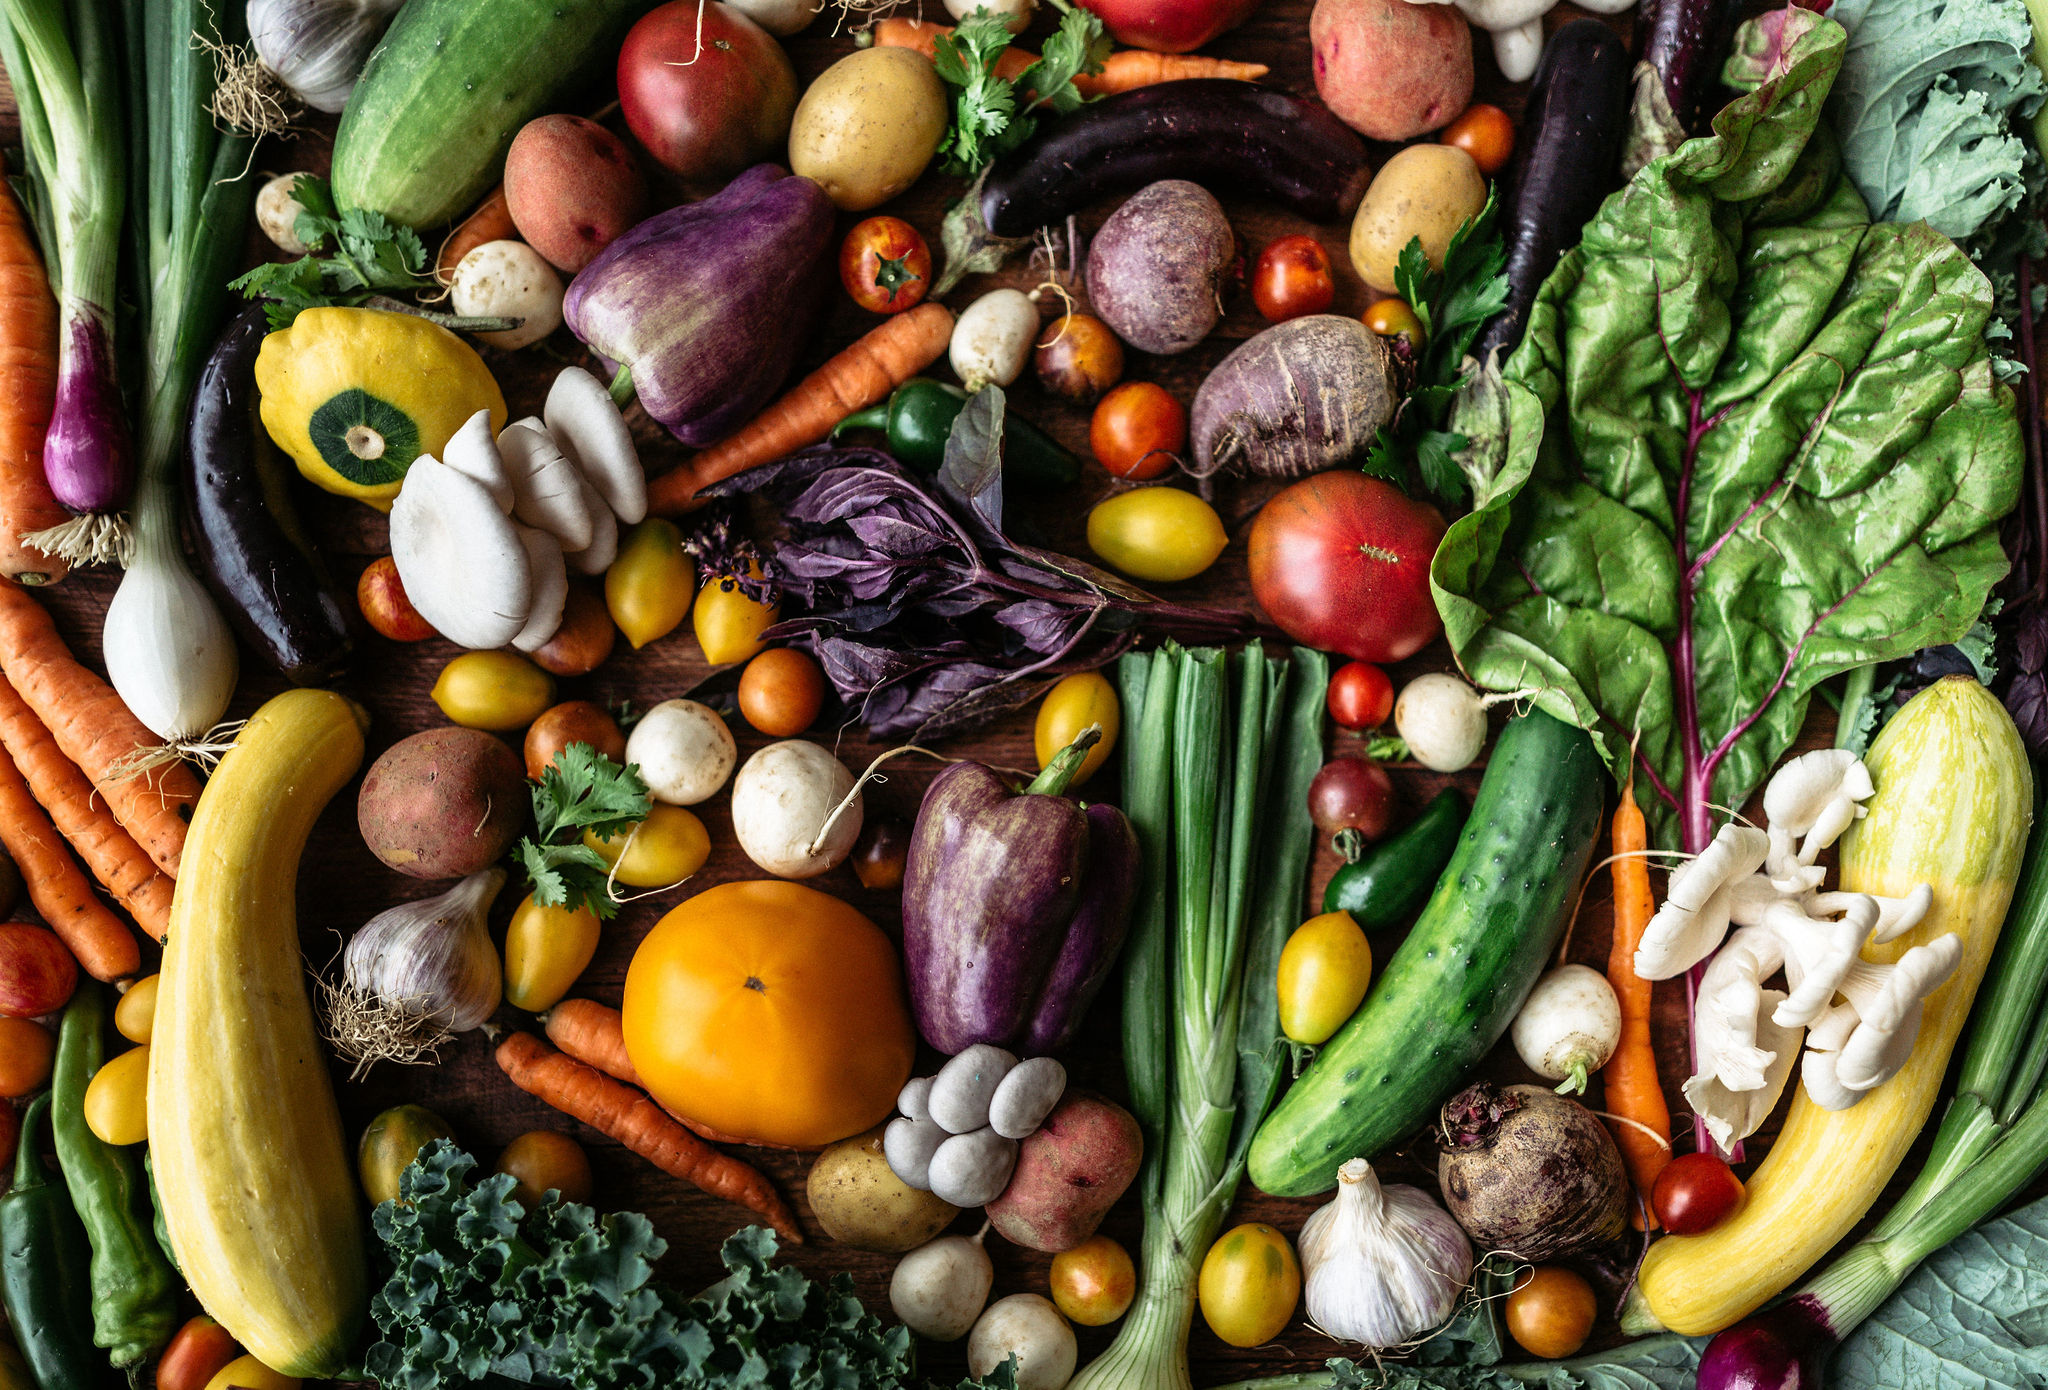 locally sourced seasonal produce